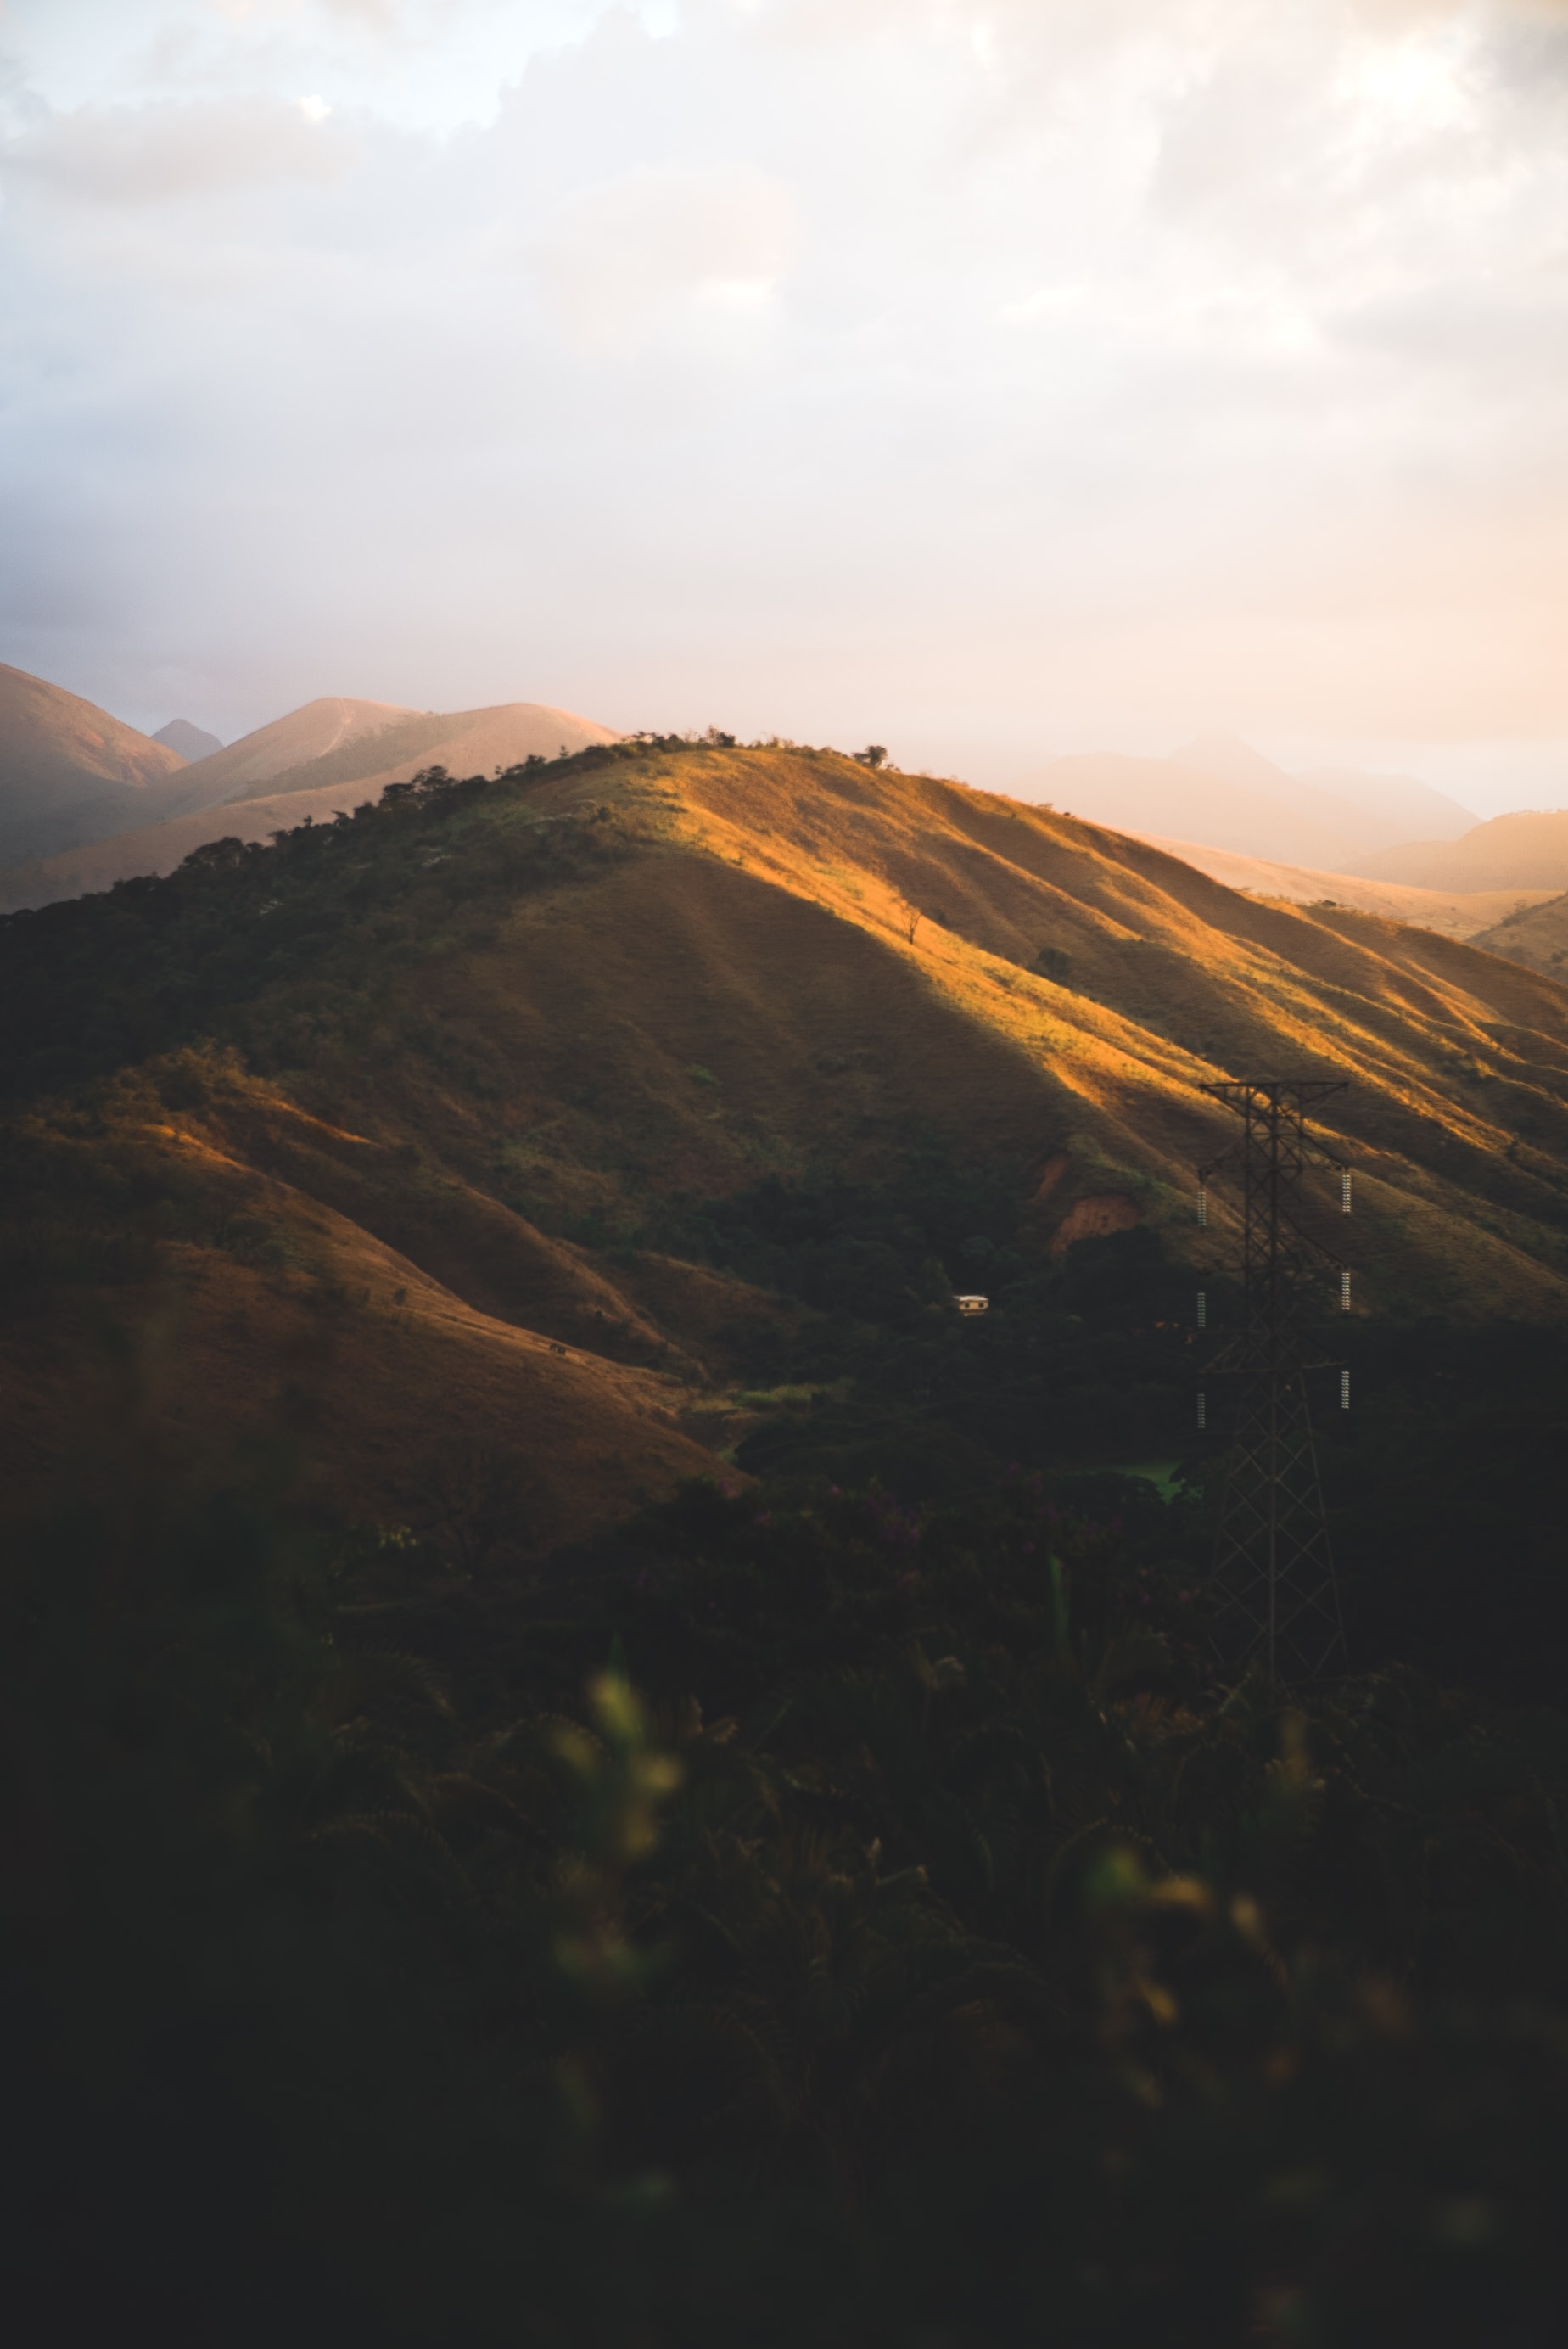 panoramic photo of mountain